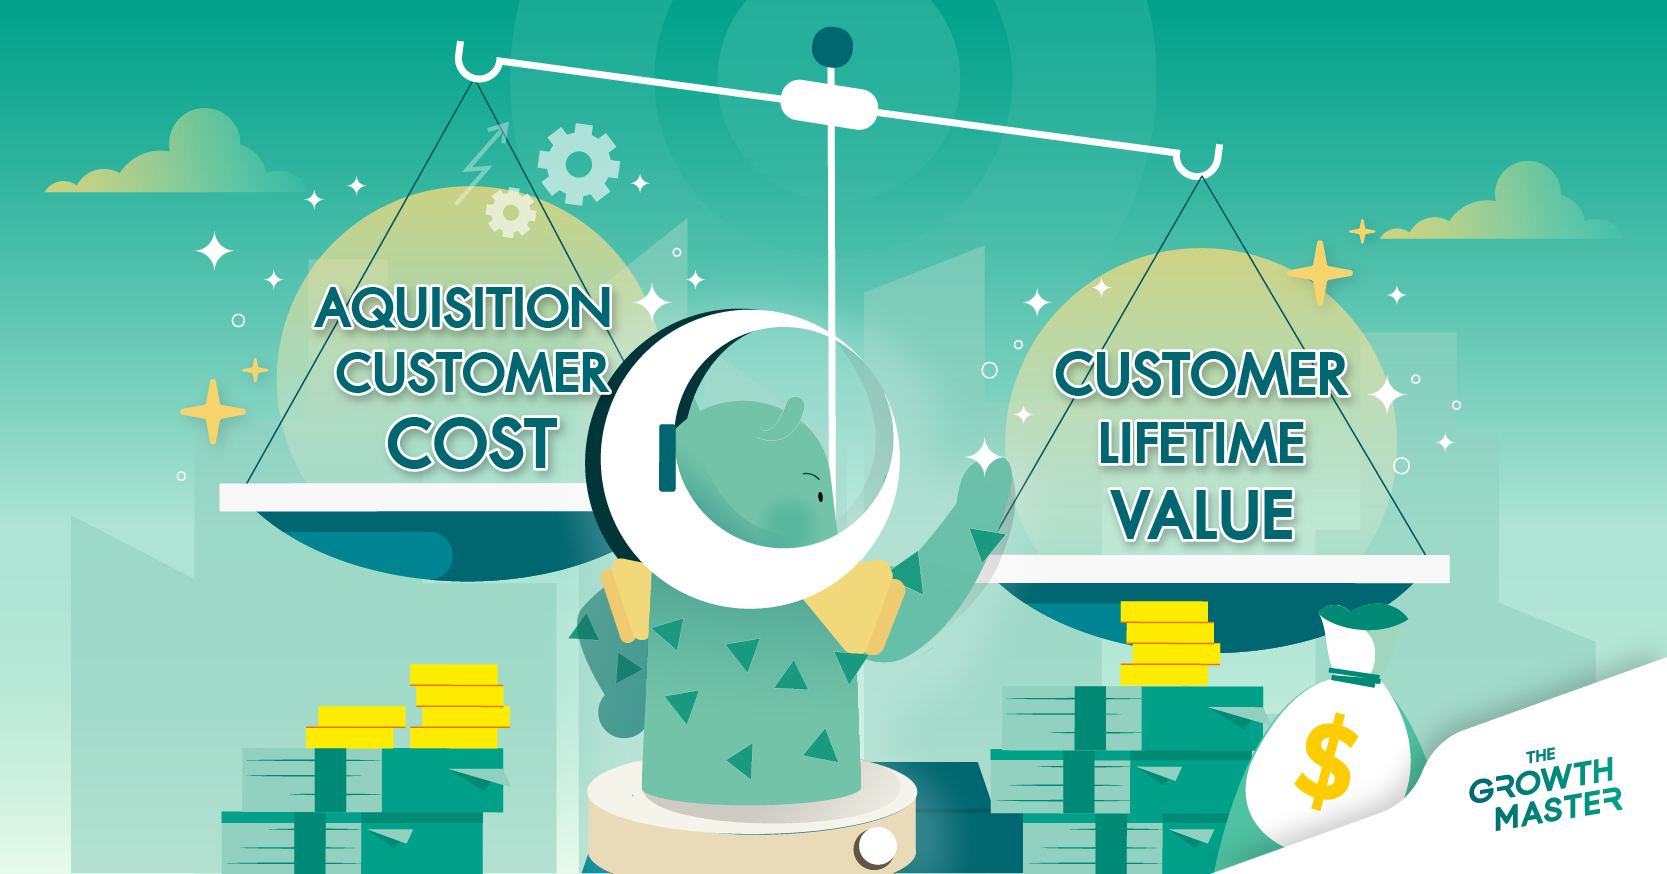 Customer Acquisition Cost 101: CAC คืออะไร? ตัวชี้วัดสำคัญที่ธุรกิจไม่ควรละเลย